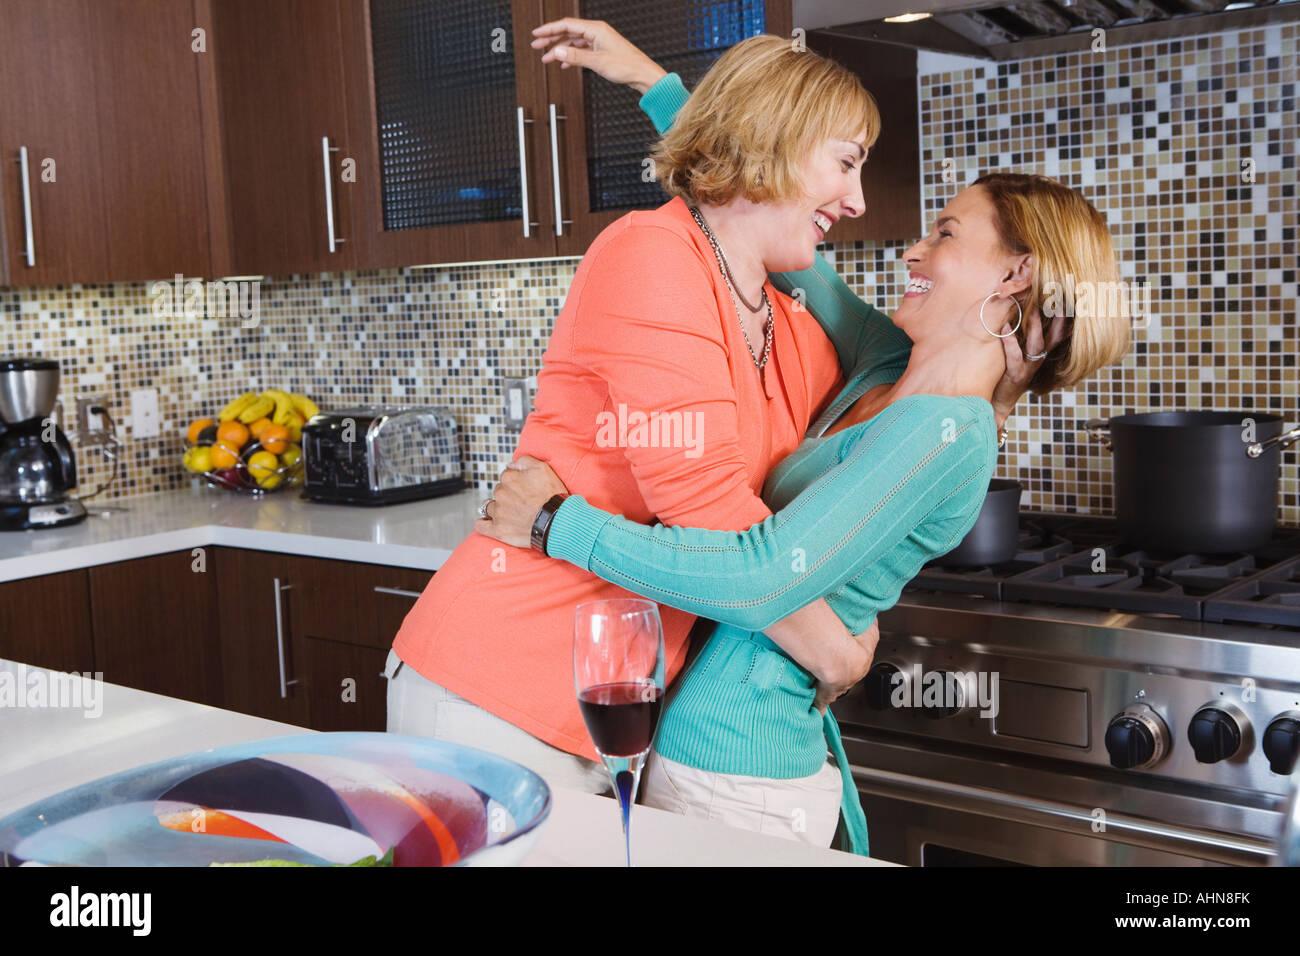 lesbian in kitchen